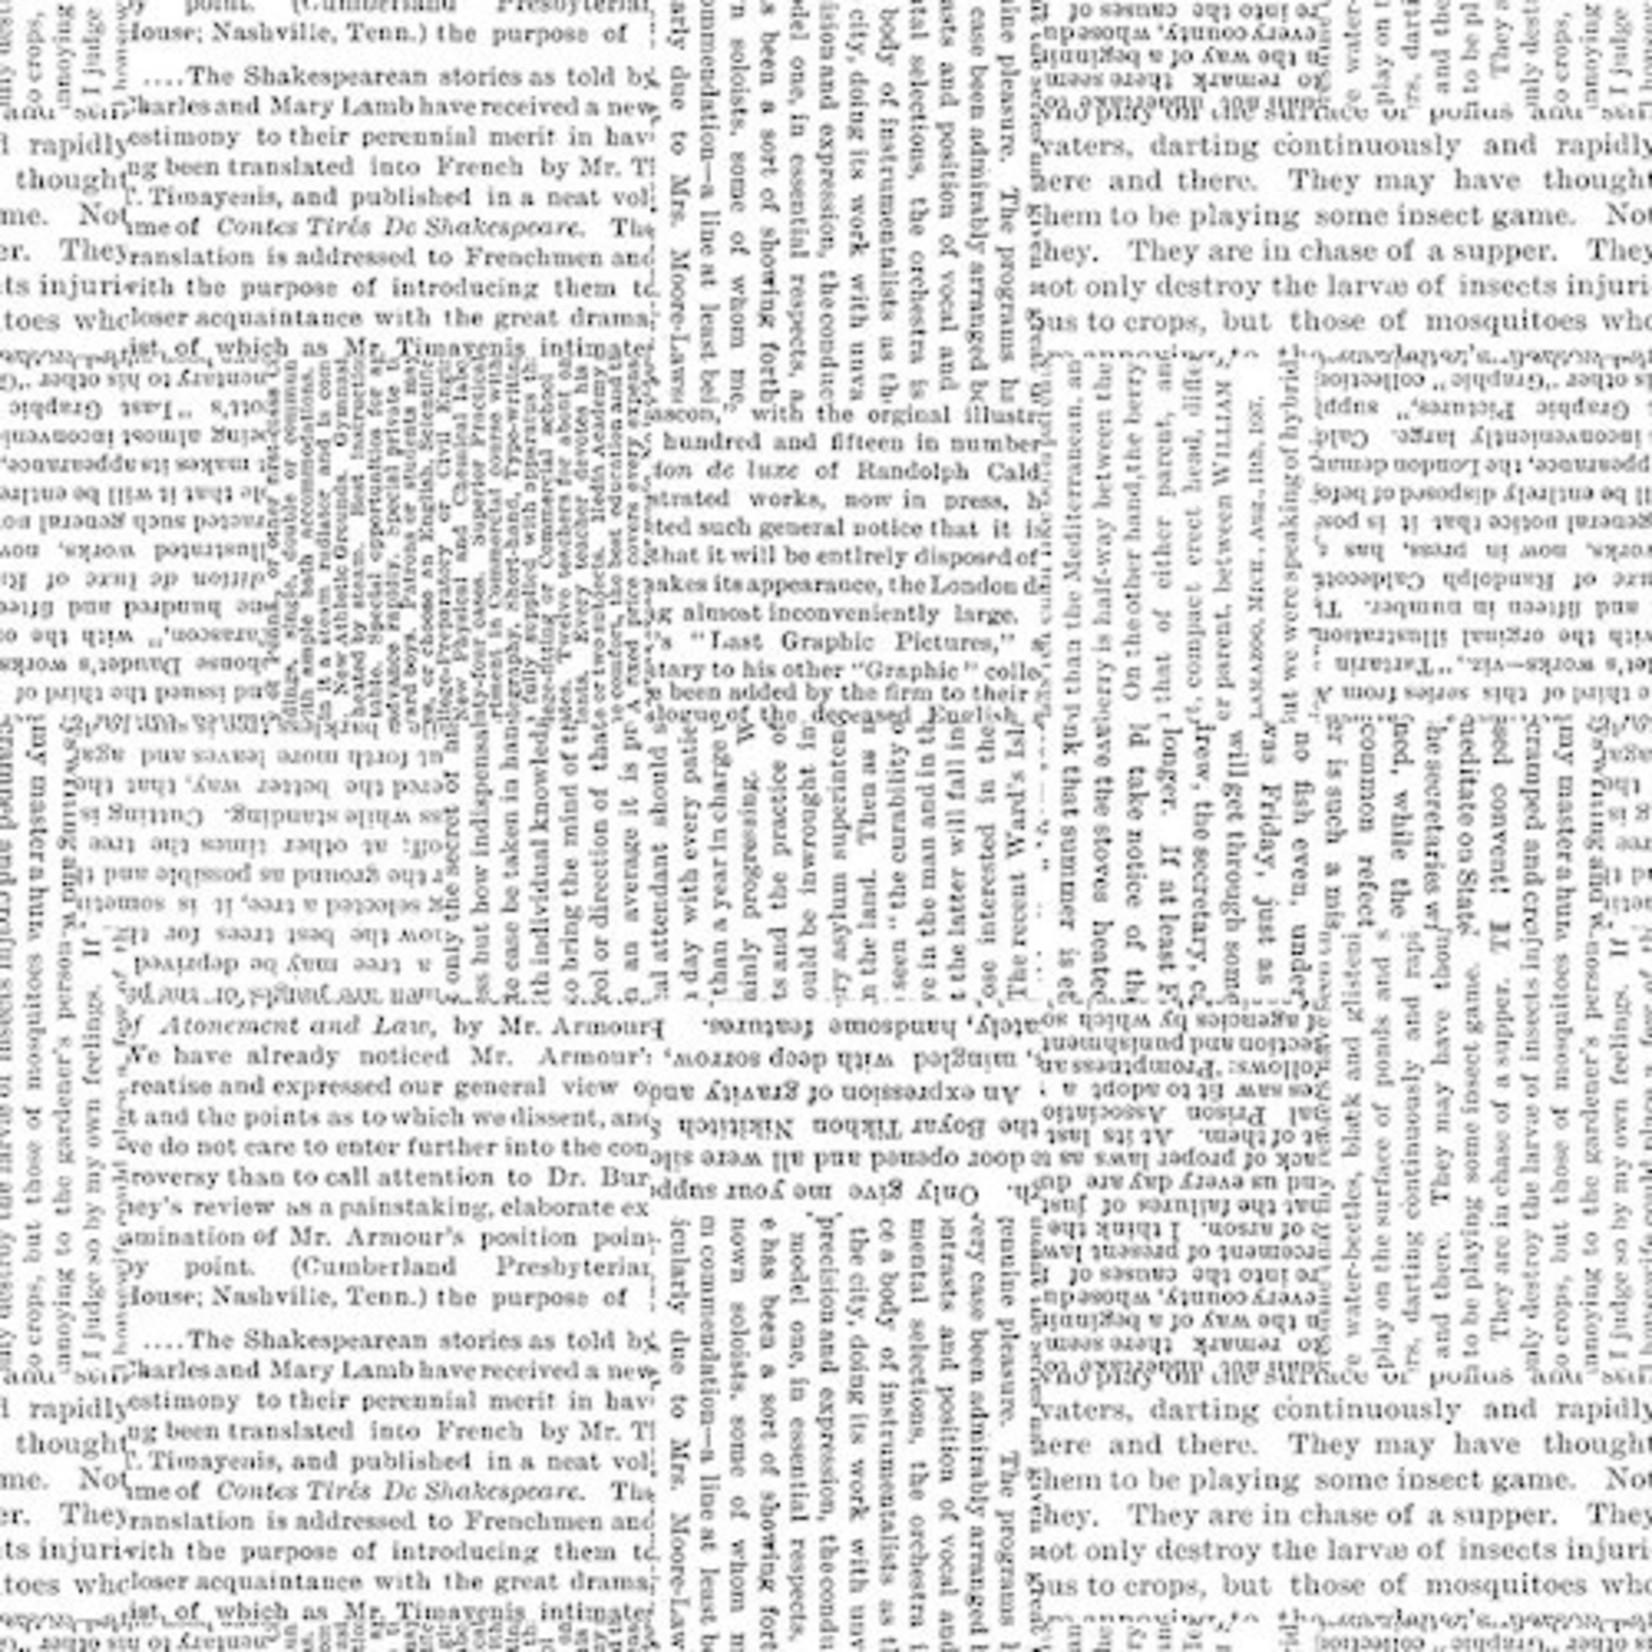 Blank Quilting Black Tie - Newspaper